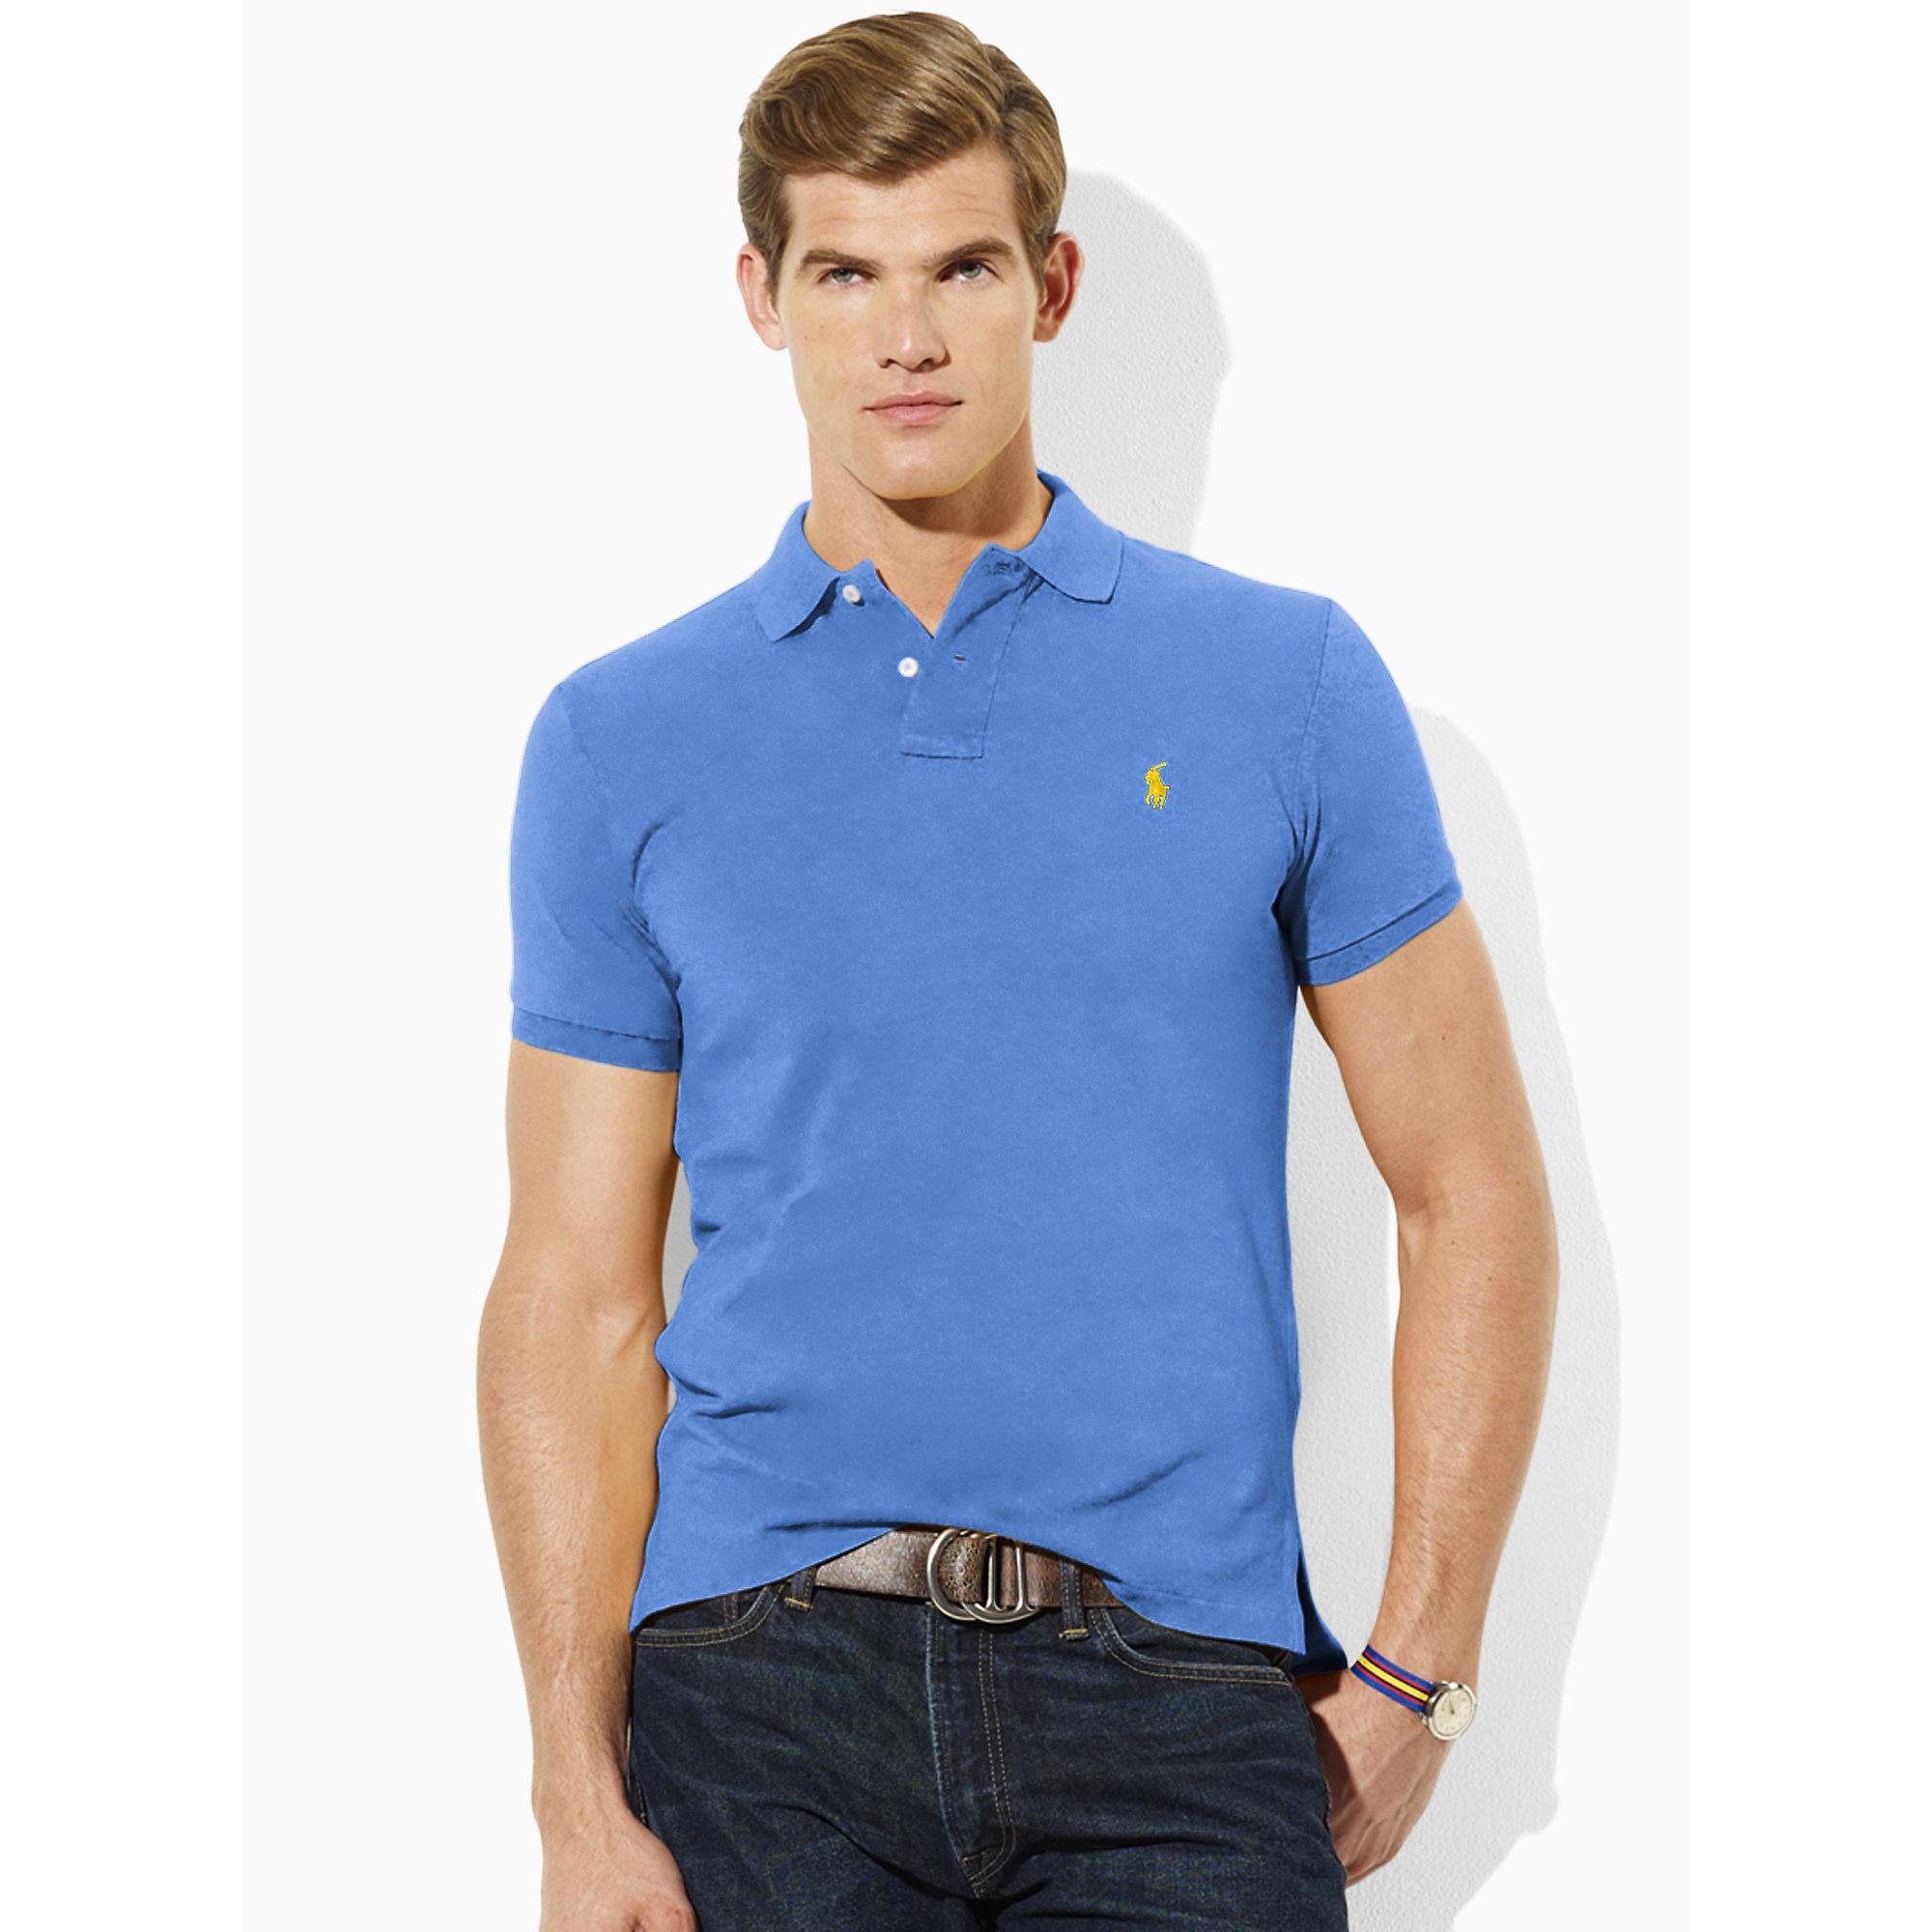 0deb41b8c8b Lyst - Polo Ralph Lauren Tall Custom-Fit Polo in Blue for Men